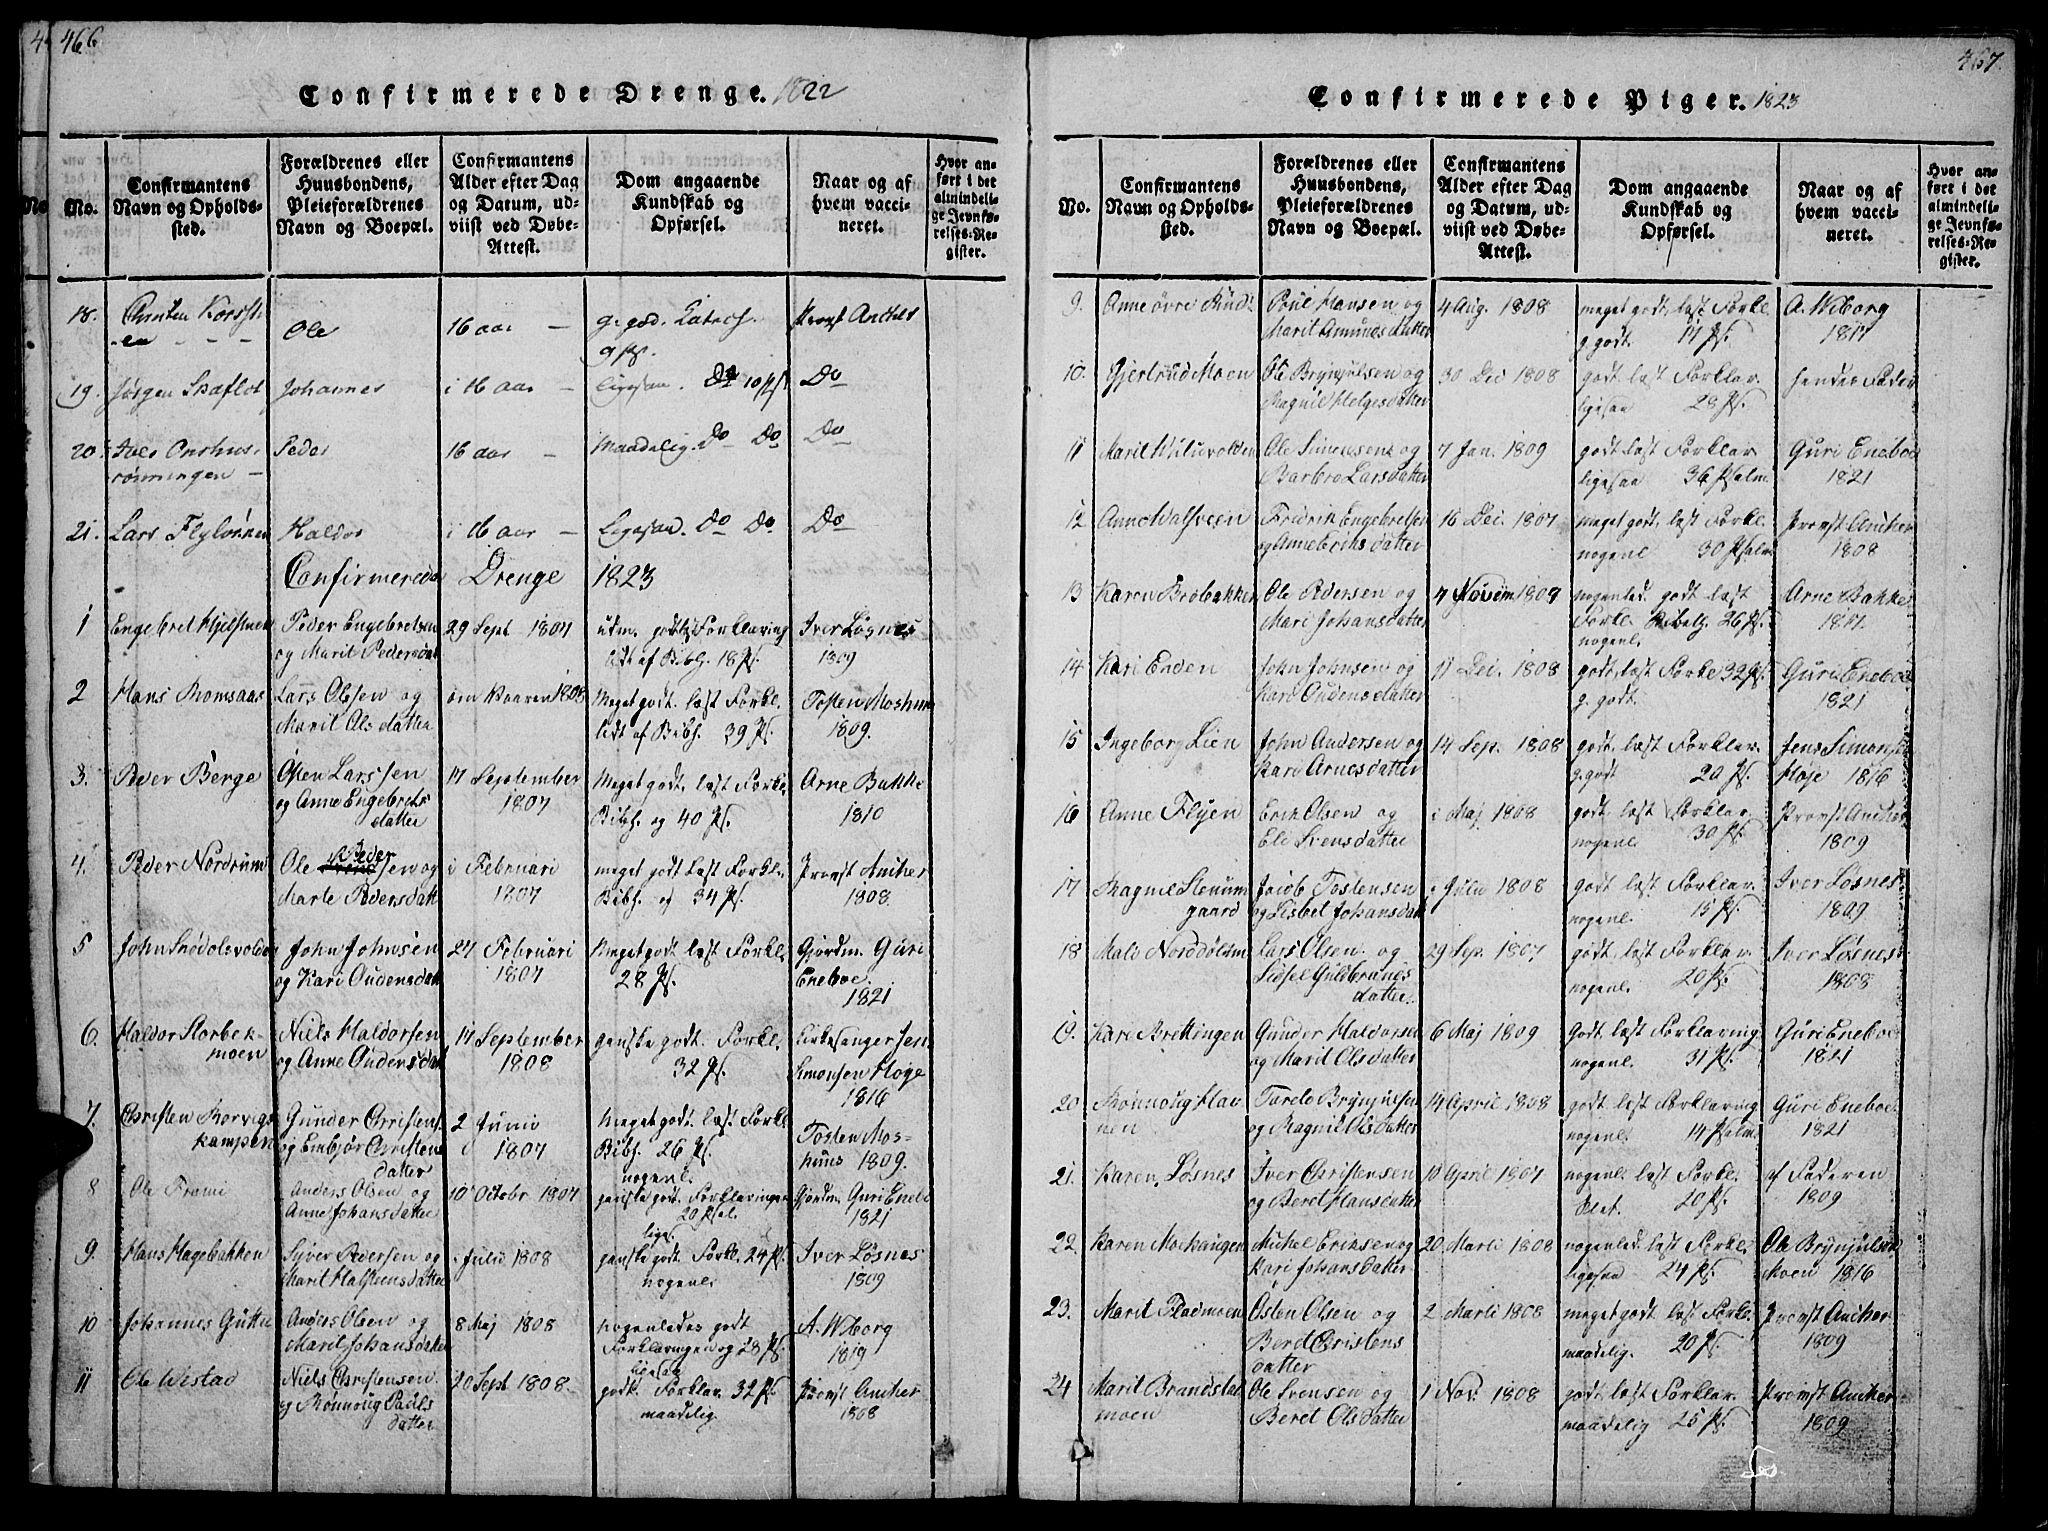 SAH, Ringebu prestekontor, Ministerialbok nr. 4, 1821-1839, s. 466-467